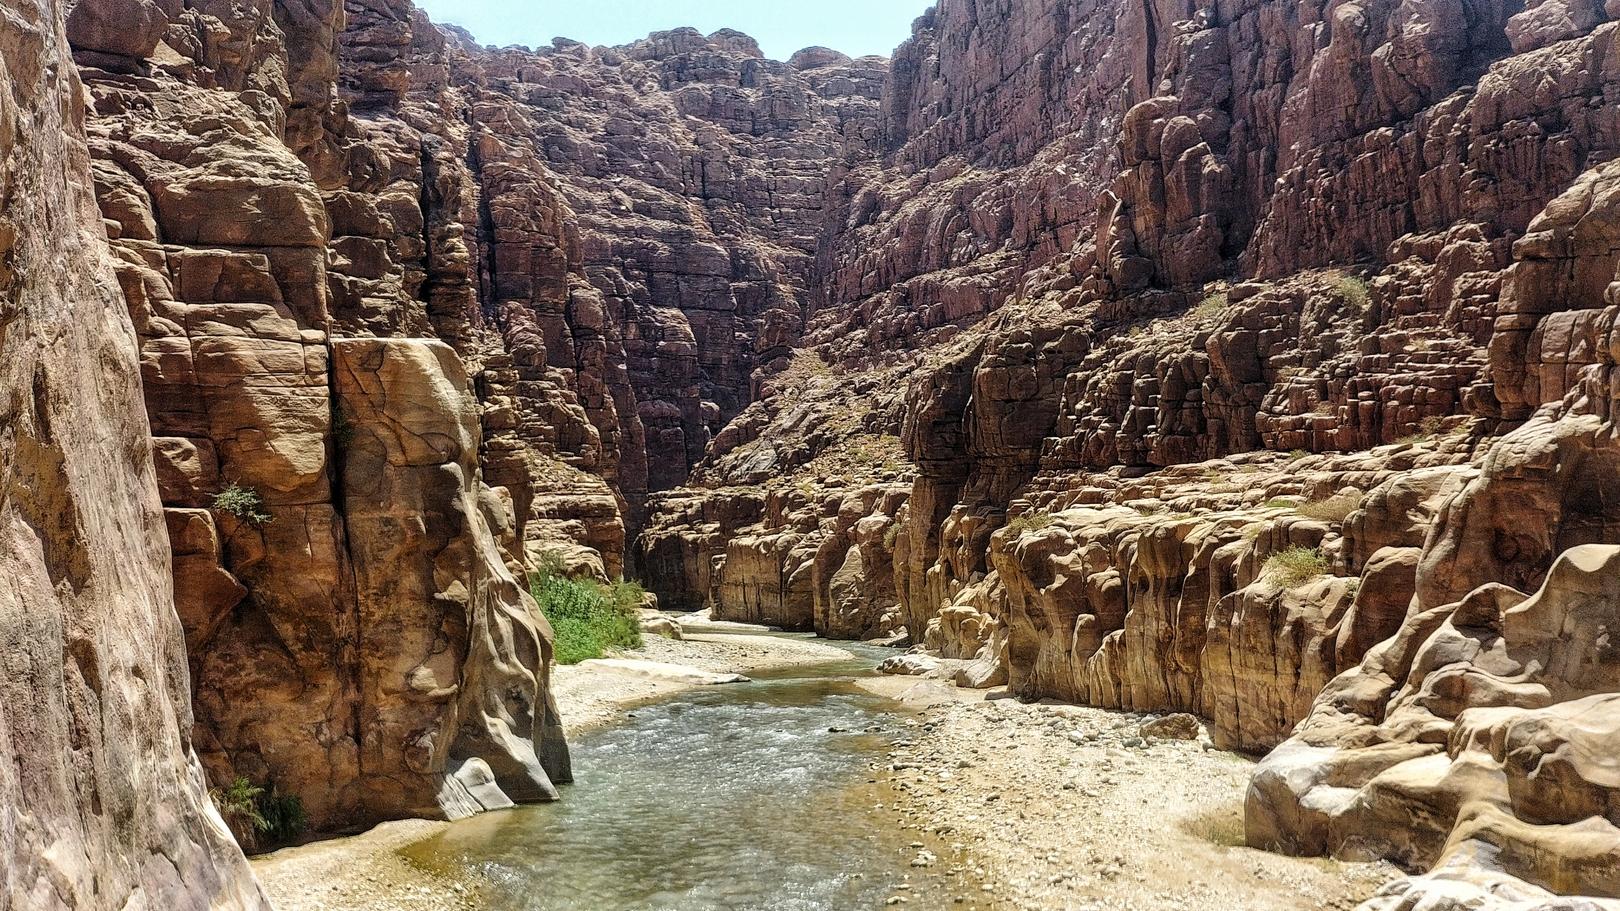 Jordanie - Canyoning dans le Wadi Mujib